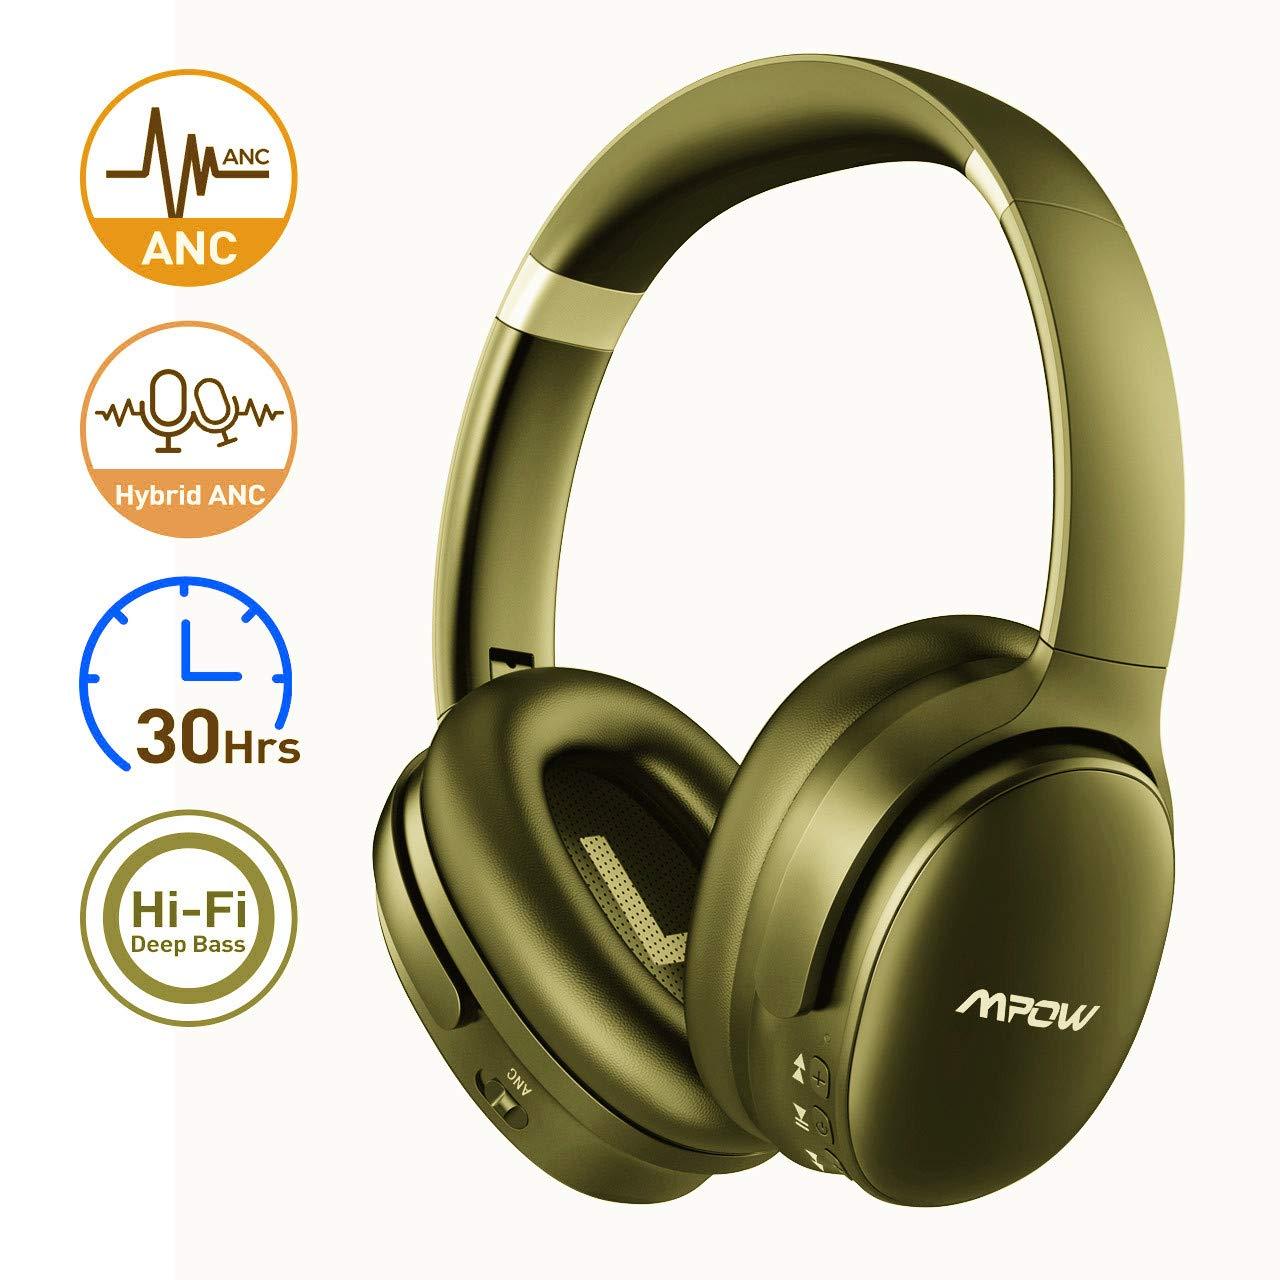 Mpow - Auriculares Bluetooth con transmisor, auriculares inalámbricos RF con radio de acción de 30 m, autonomía de 30 horas, auriculares de TV plegables Over-Ear, reducción de ruido, auriculares para TV/PC/receptor AV/juegos: